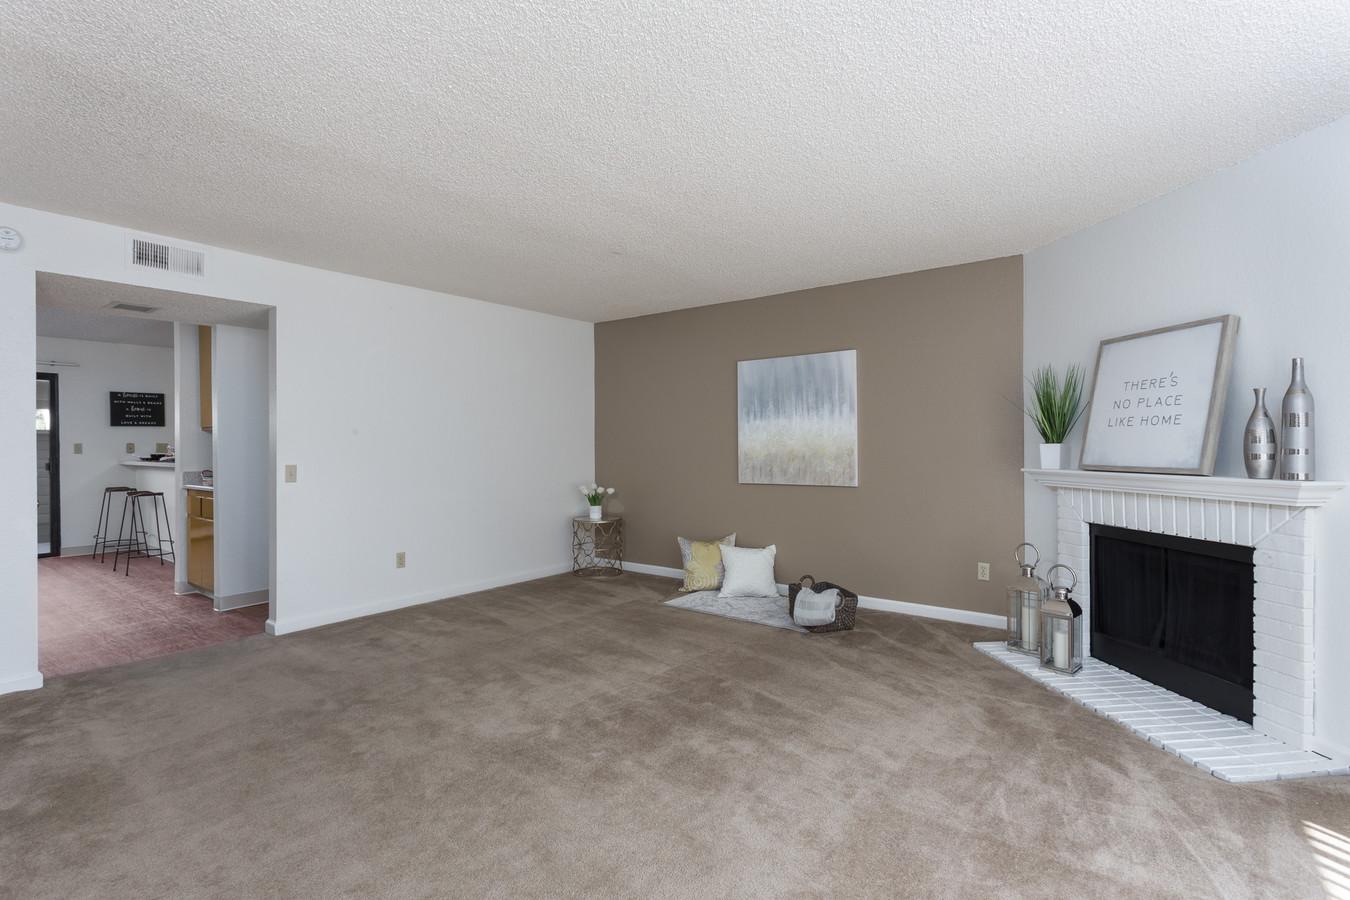 Woodbridge Apartments for rent